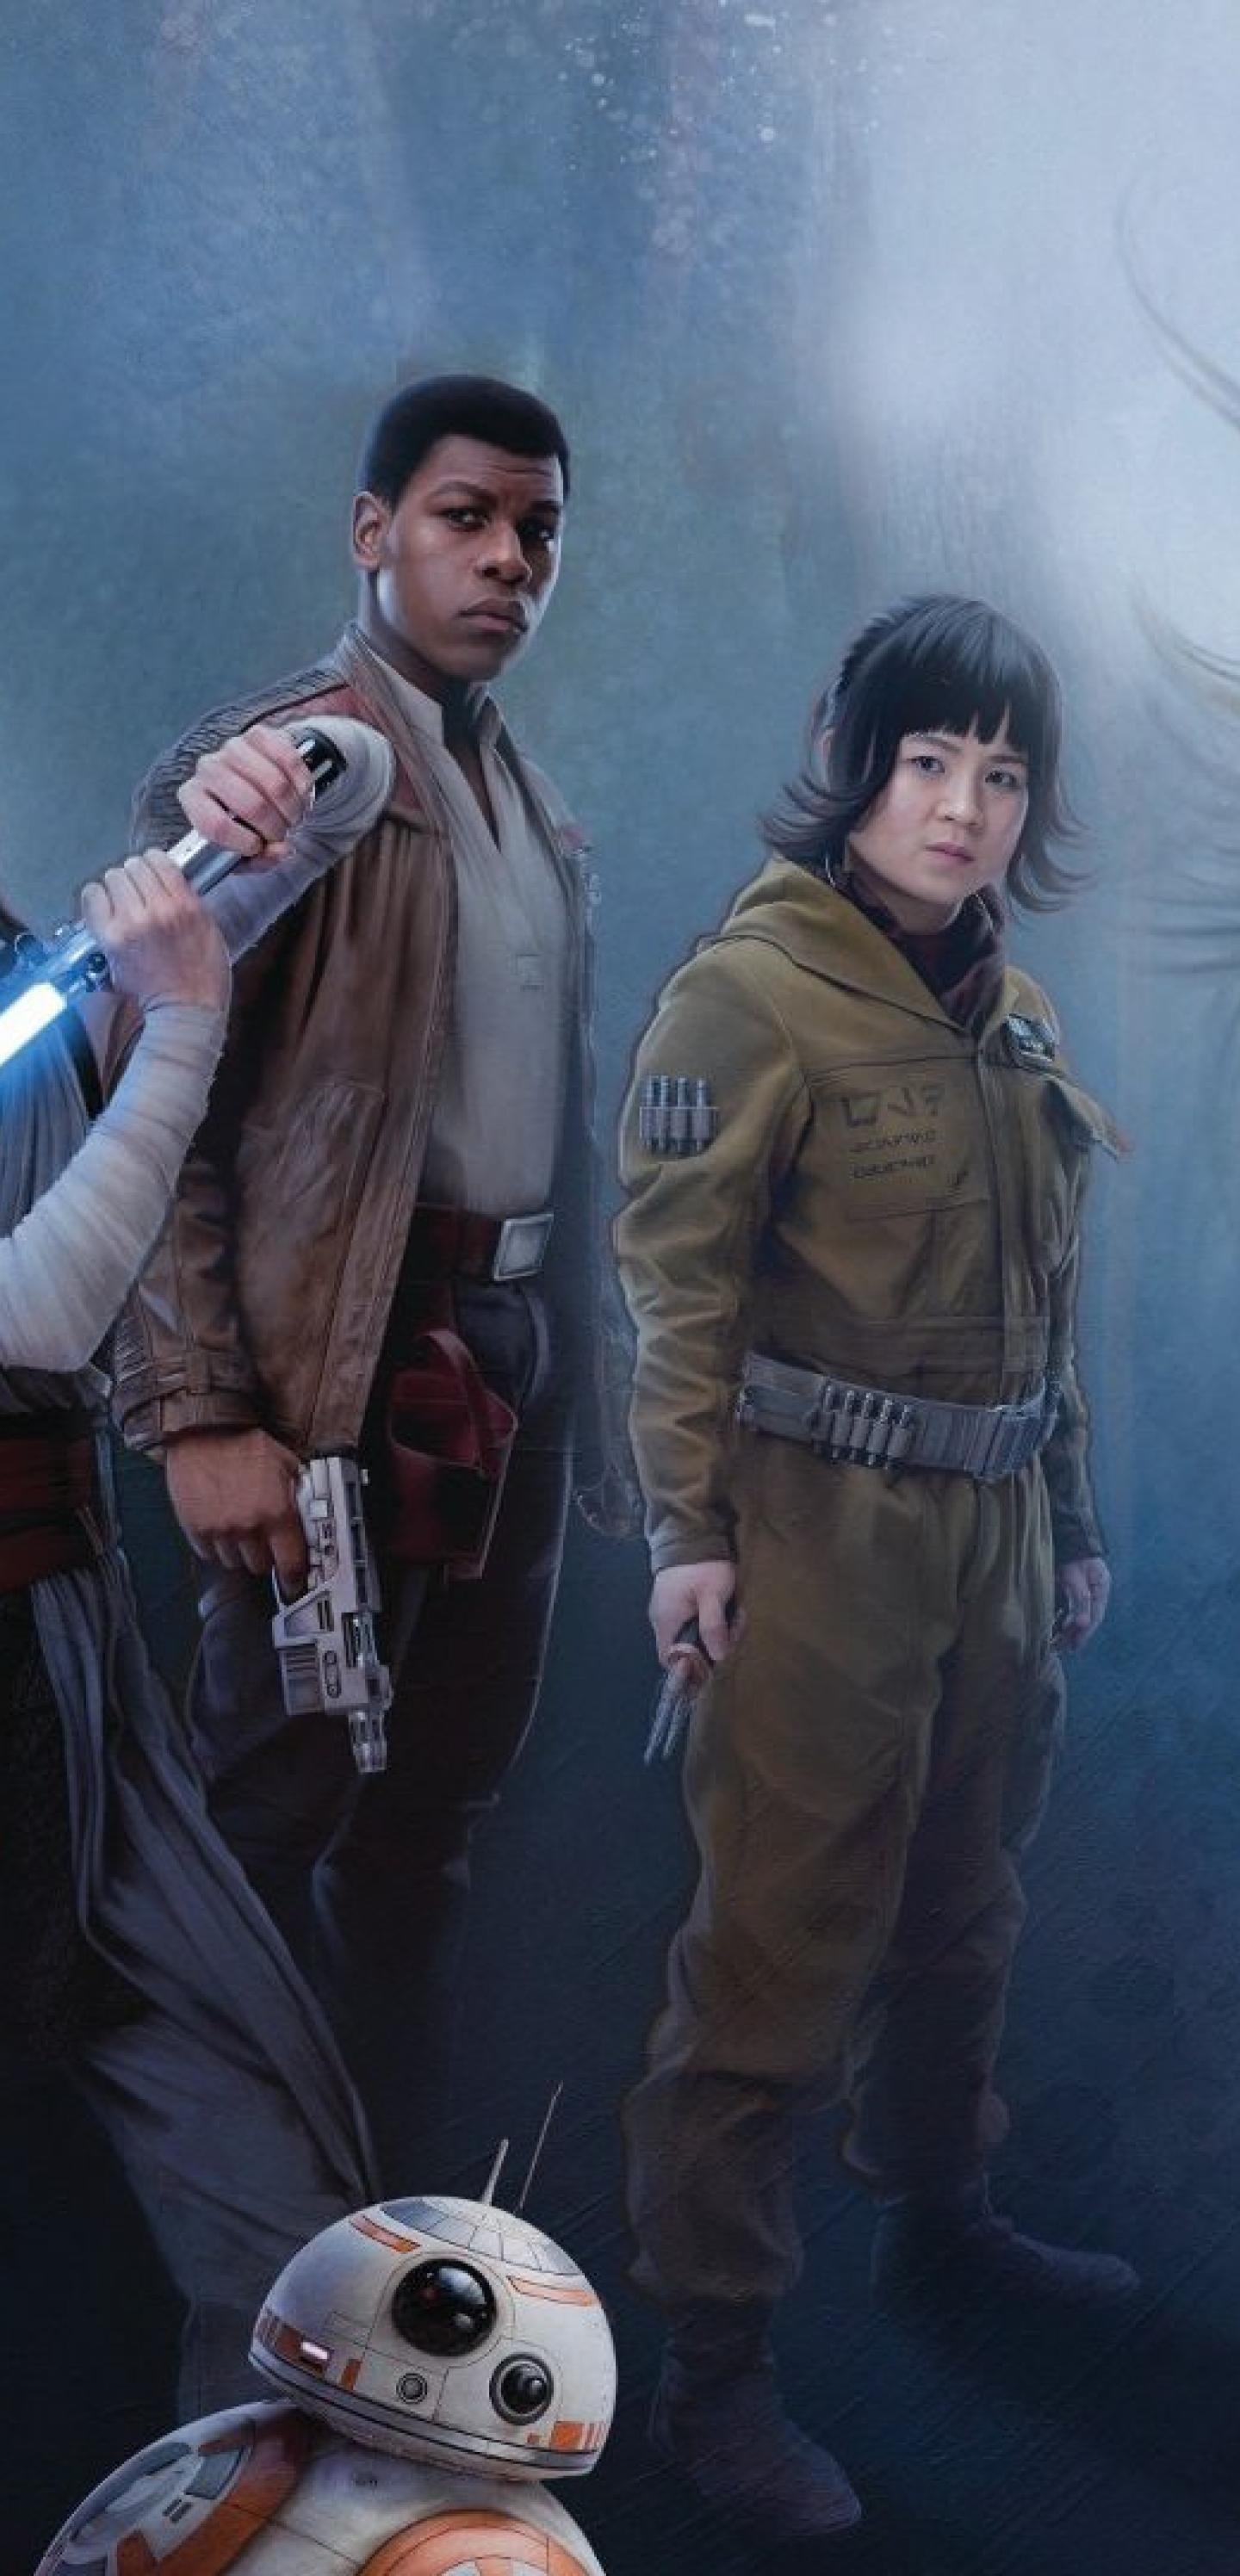 1440x2992 Star Wars Jedi Rey Daisy Ridley And Luke Skywalker